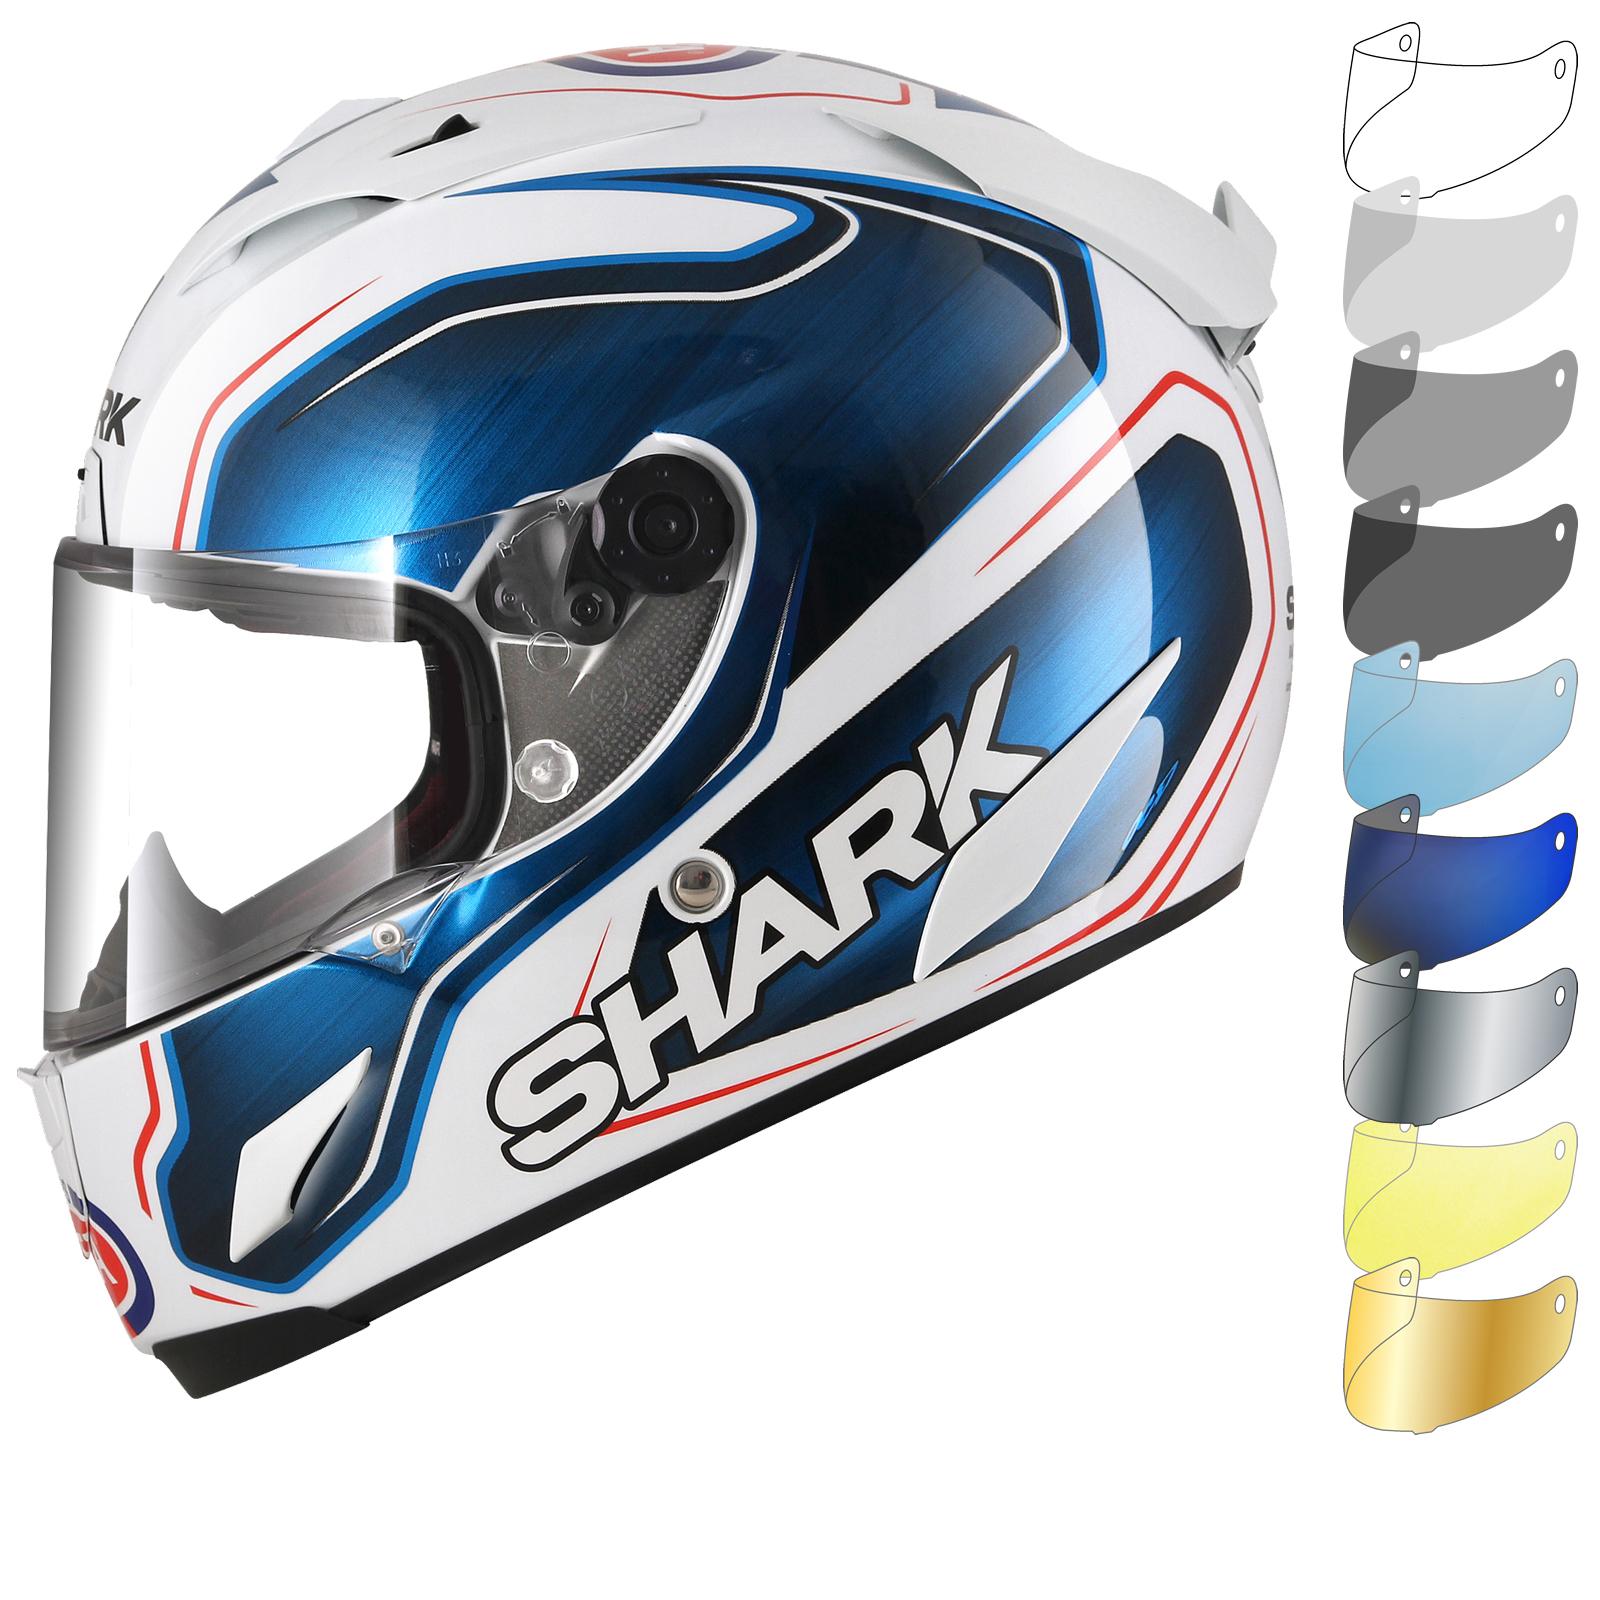 shark race r pro guintoli replica motorcycle helmet visor full face helmets. Black Bedroom Furniture Sets. Home Design Ideas